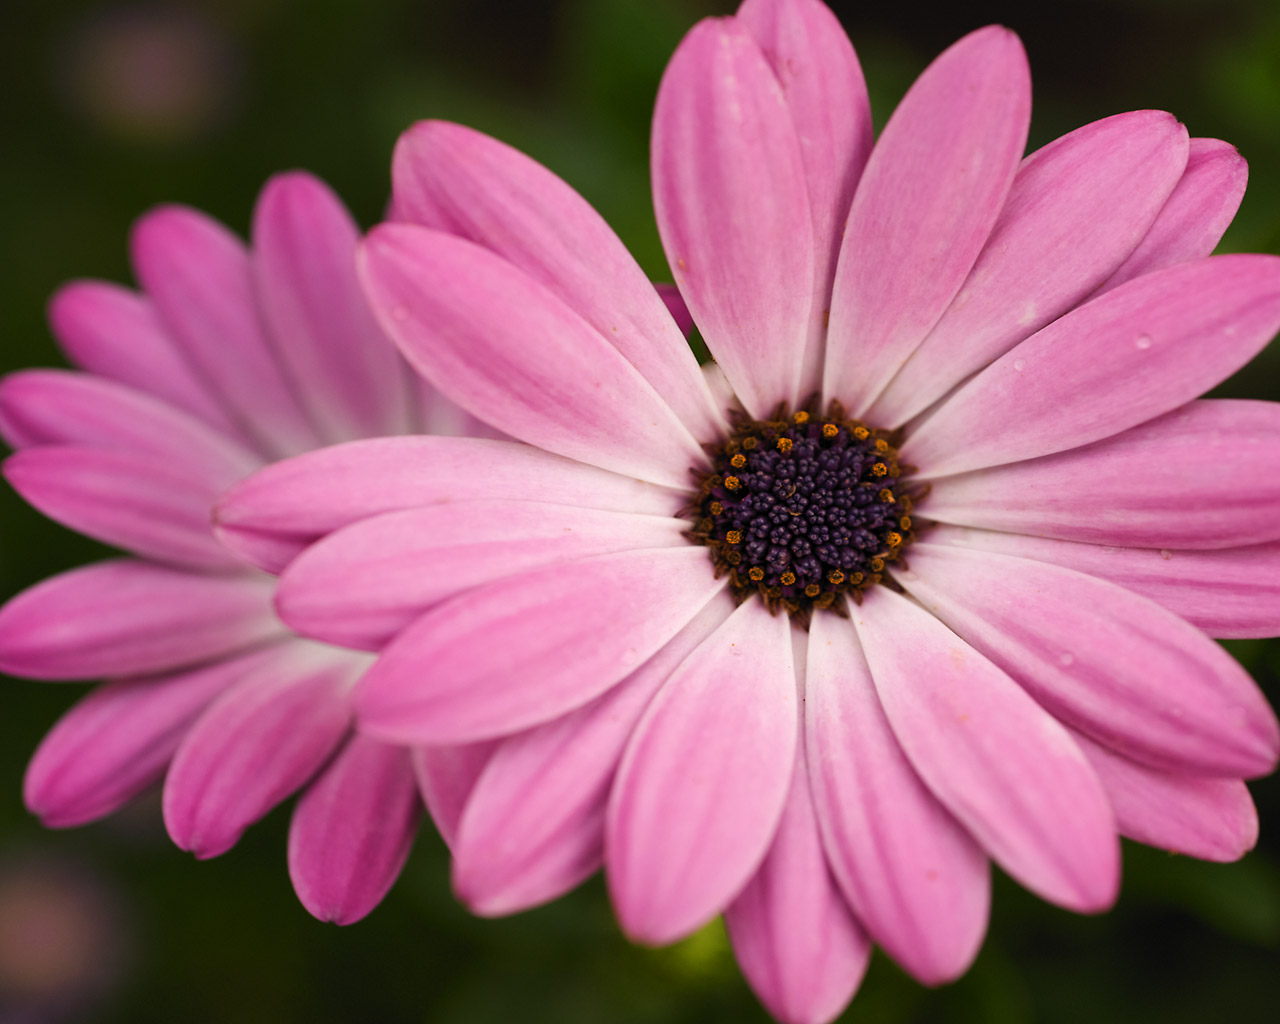 JulesDesigns: Summer time, flower time...